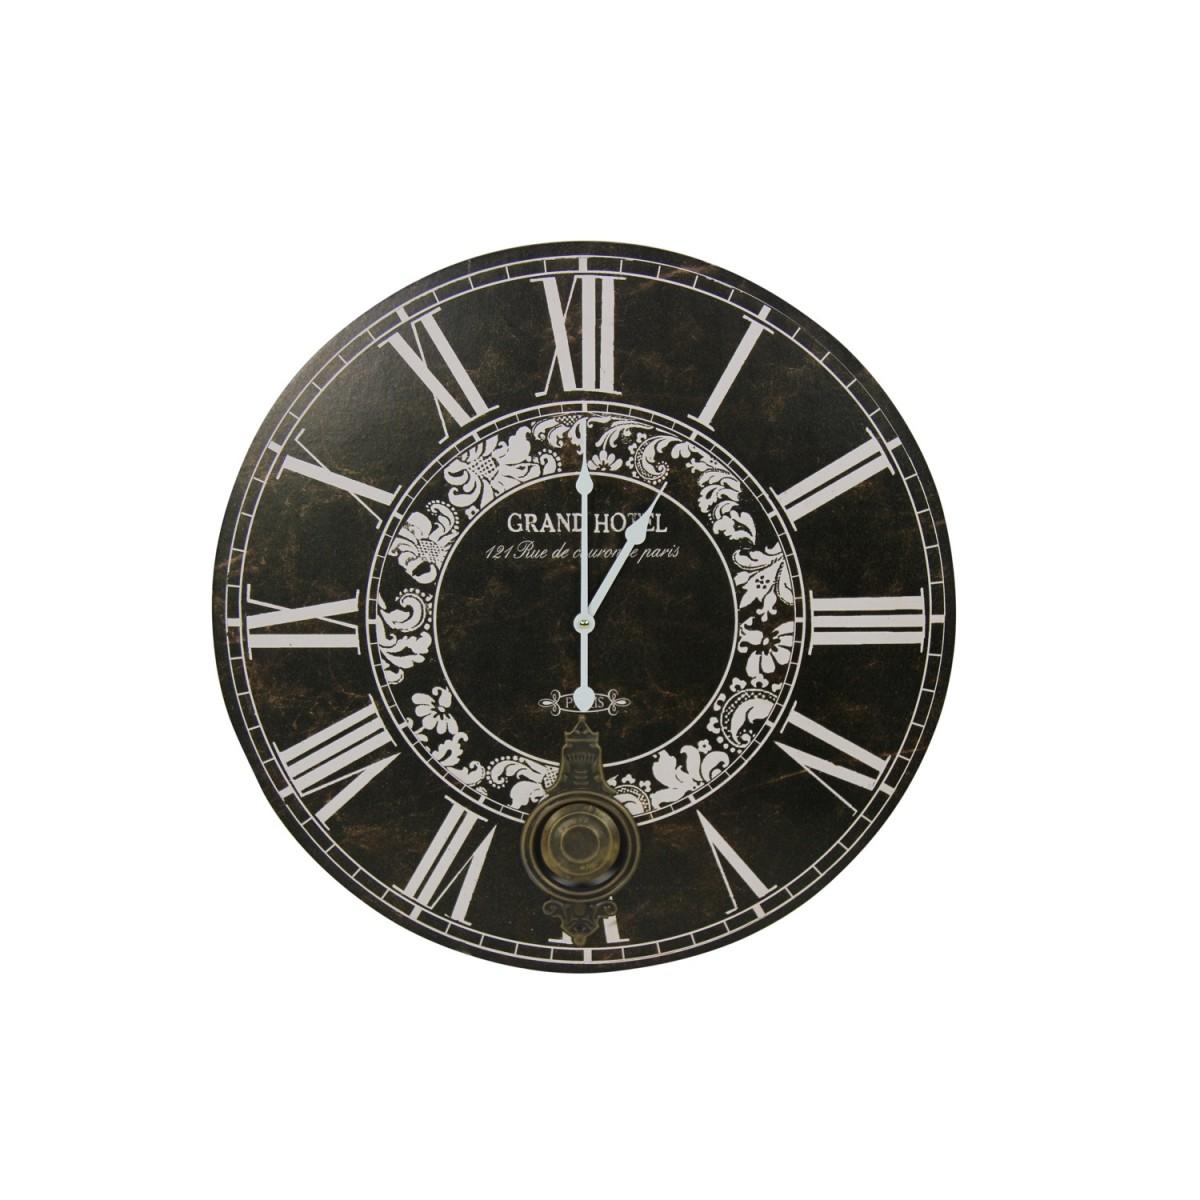 Horloge Ancienne Balancier Grand Hôtel 58cm